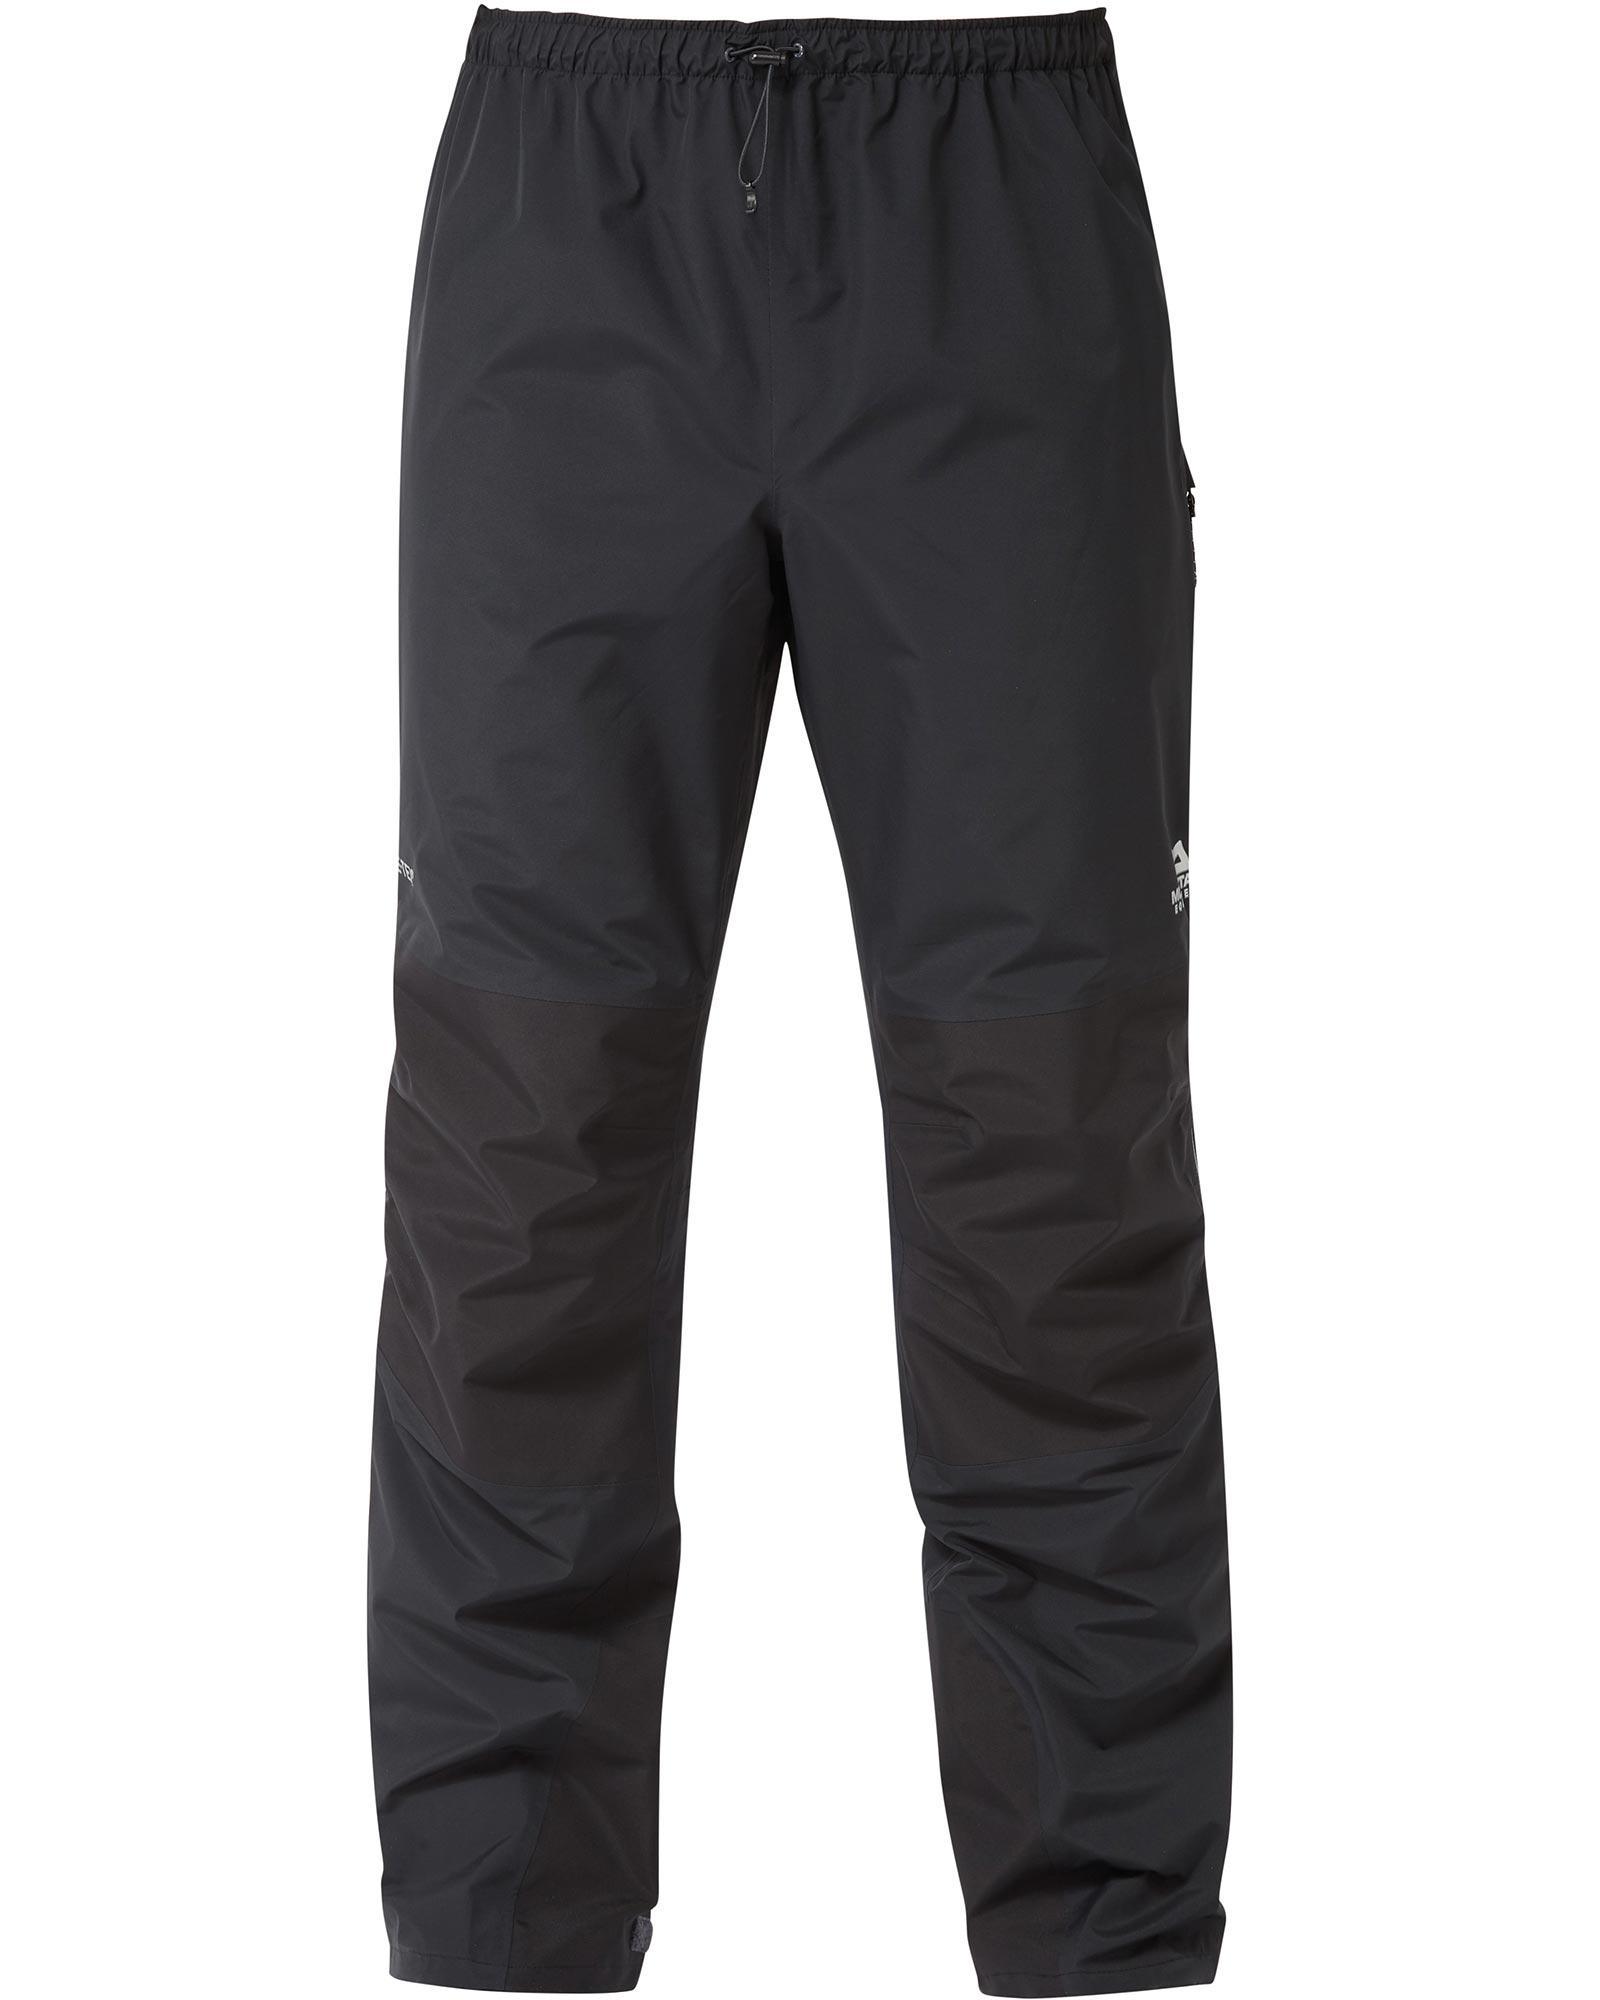 Mountain Equipment Men's Saltoro GORE-TEX PACLITE Plus Pants 0